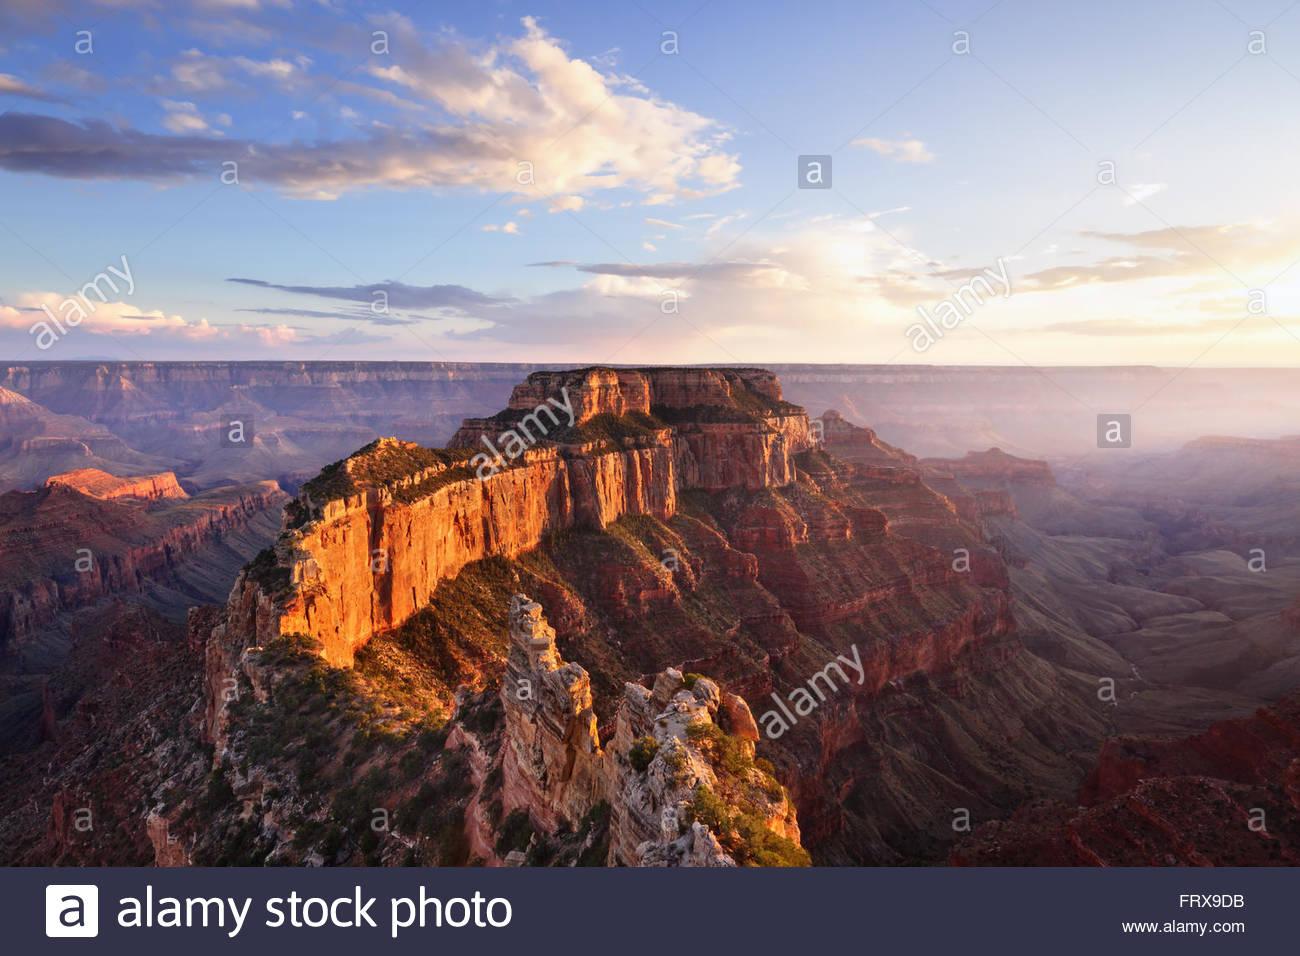 Wotans Throne, Cape Royal at Sunset, Grand Canyon North Rim, AZ - Stock Image